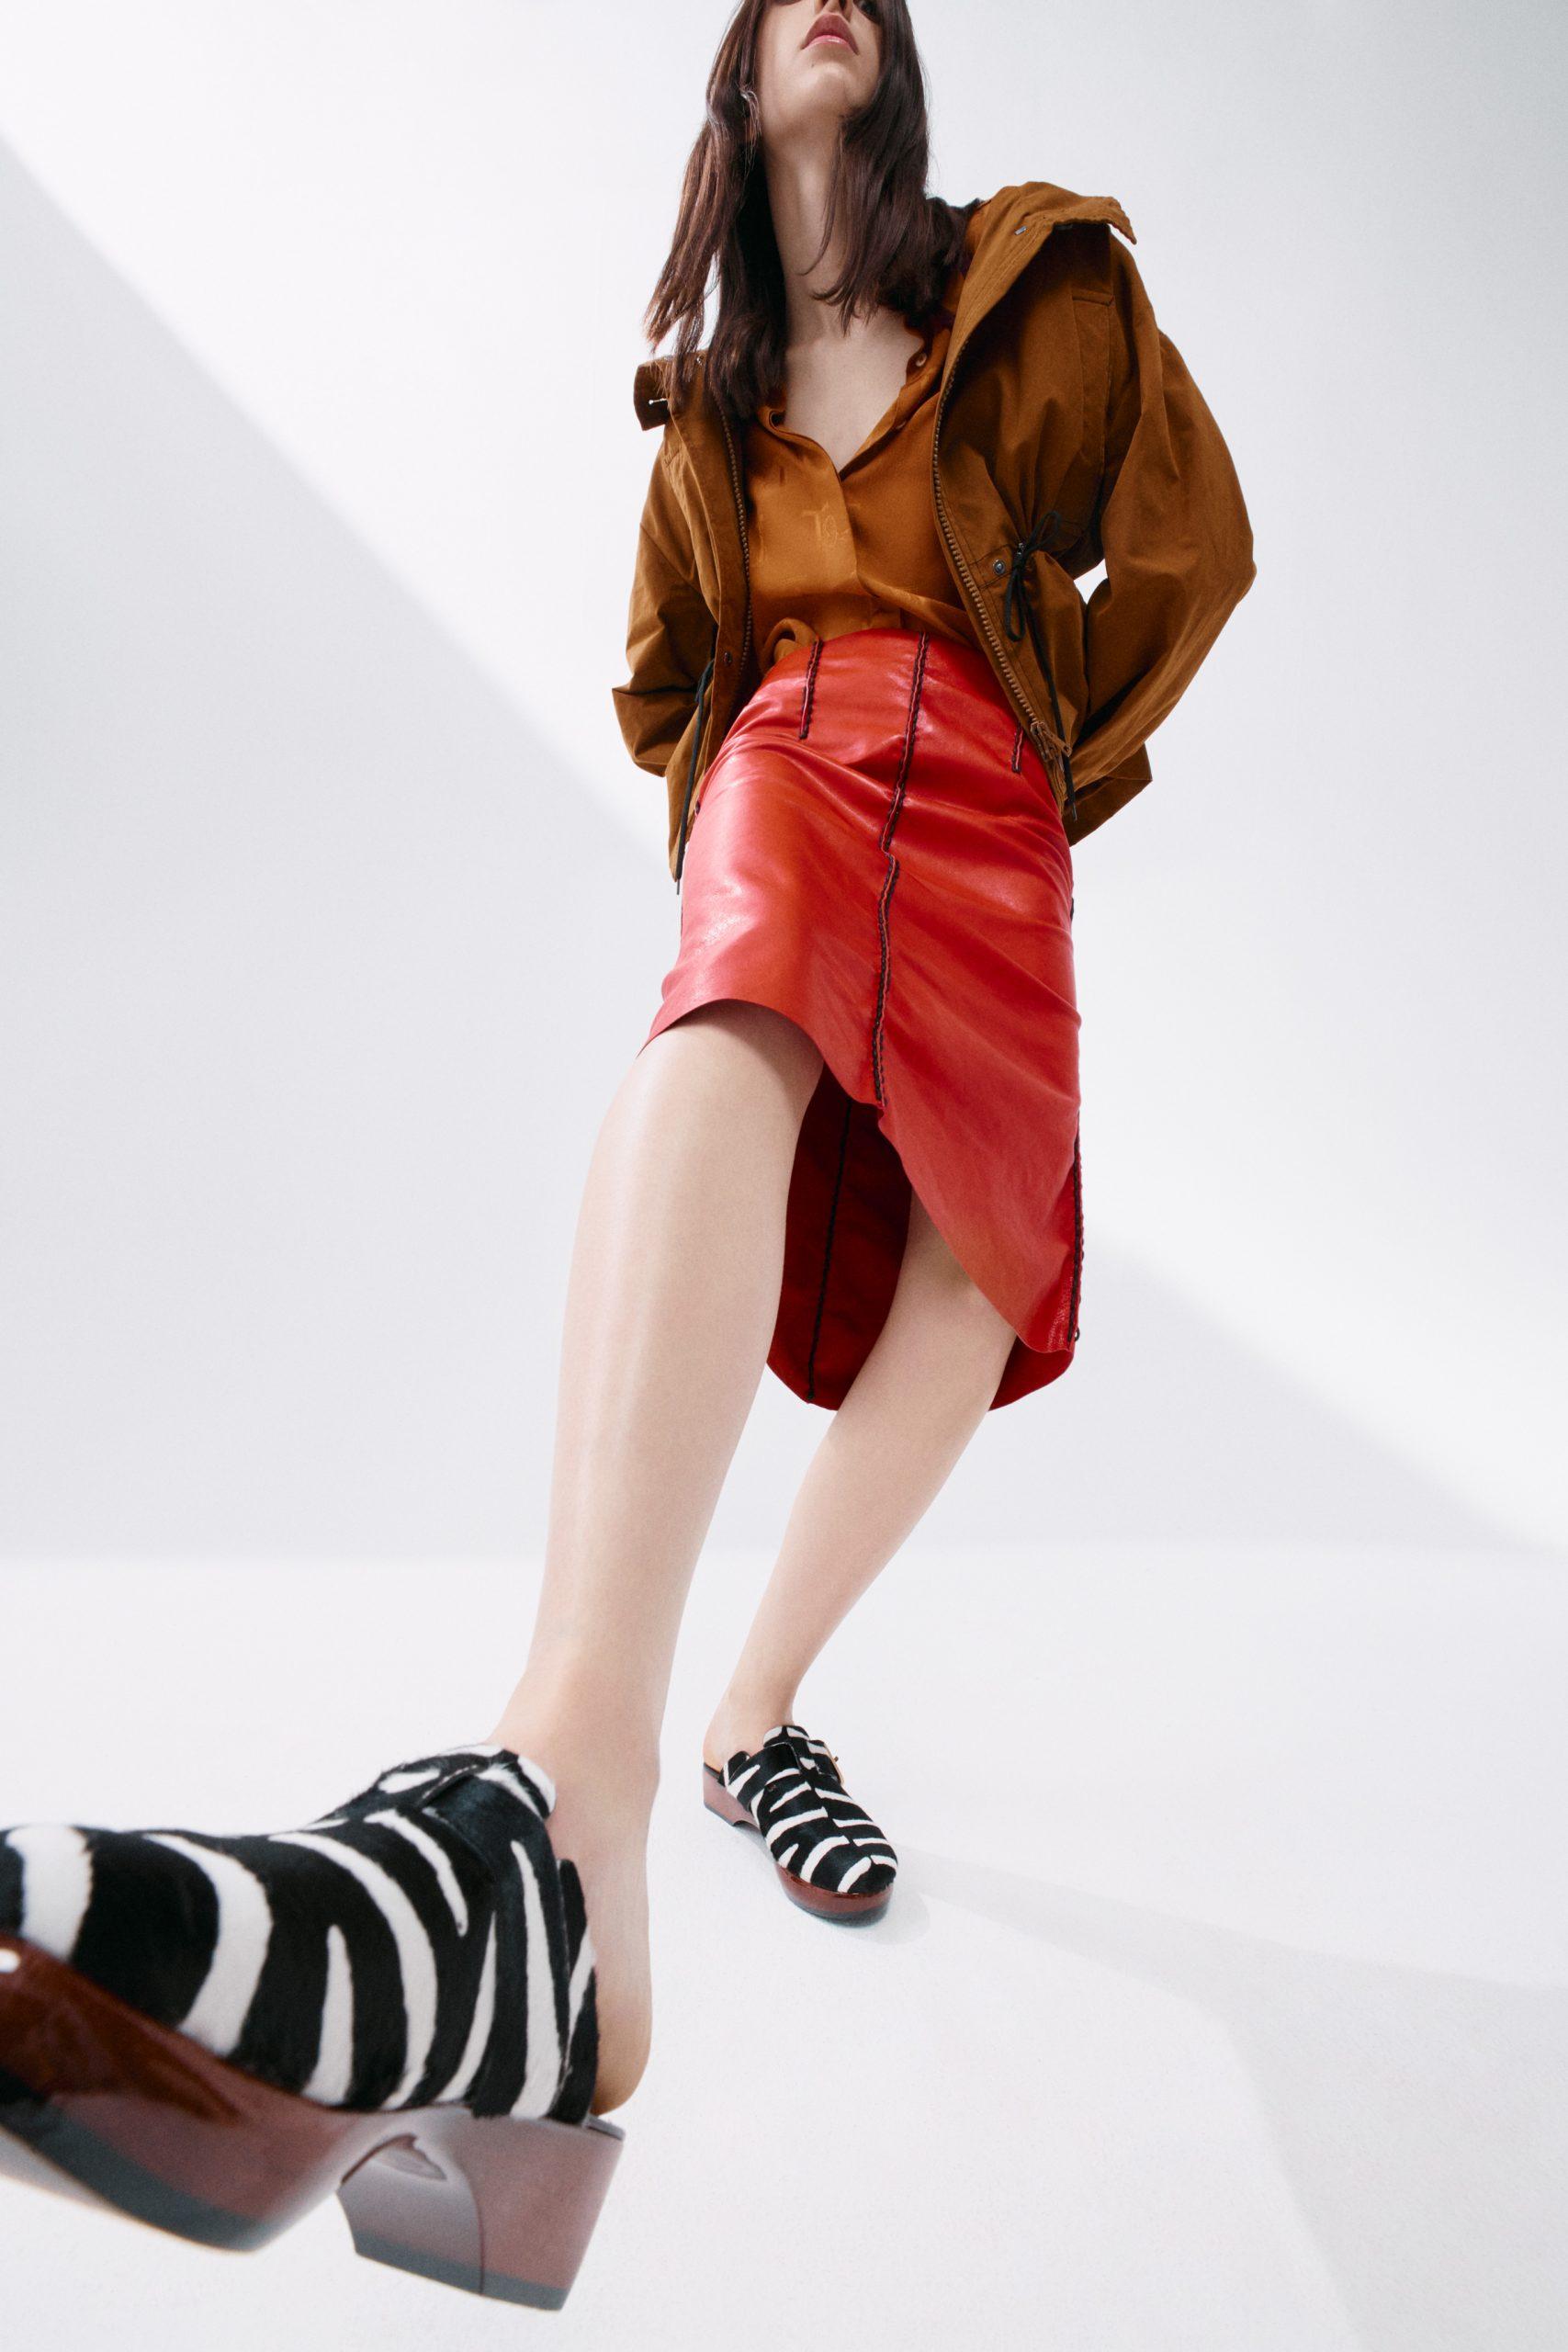 Tod's Resort 2022 Fashion Show Photos